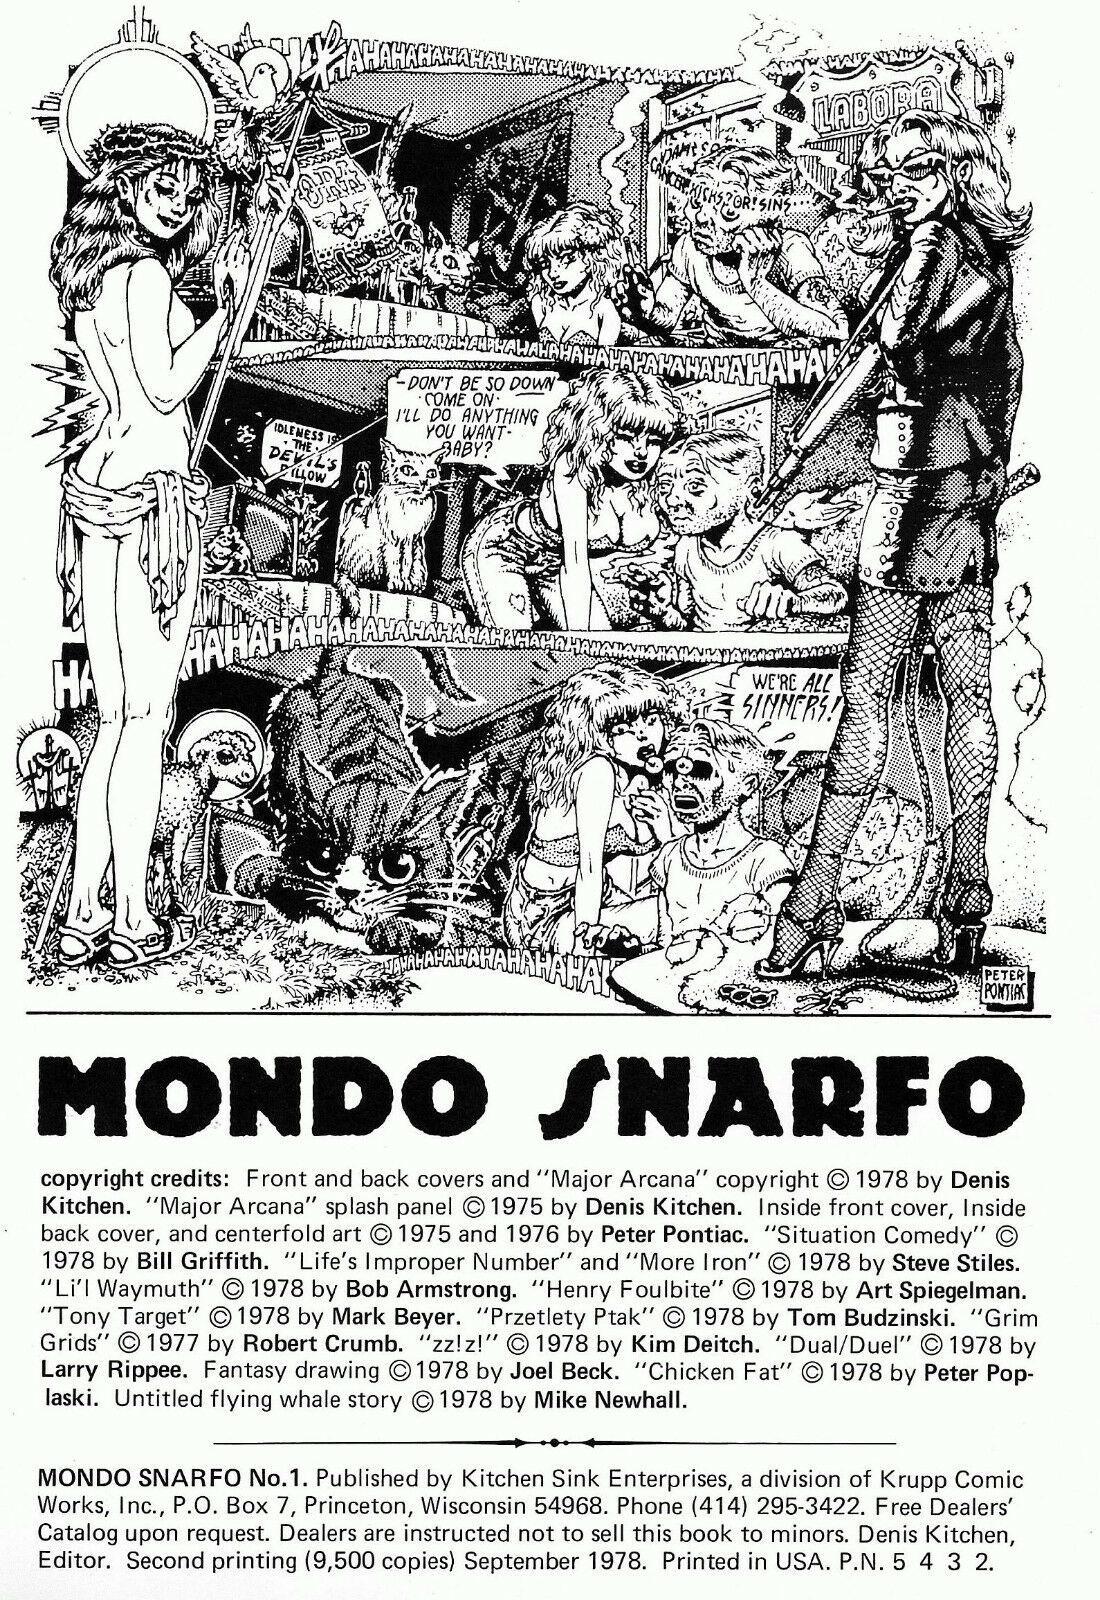 Mondo Snarfo, Kitchen Sink 1978, - 2nd printing, Classic underground comix